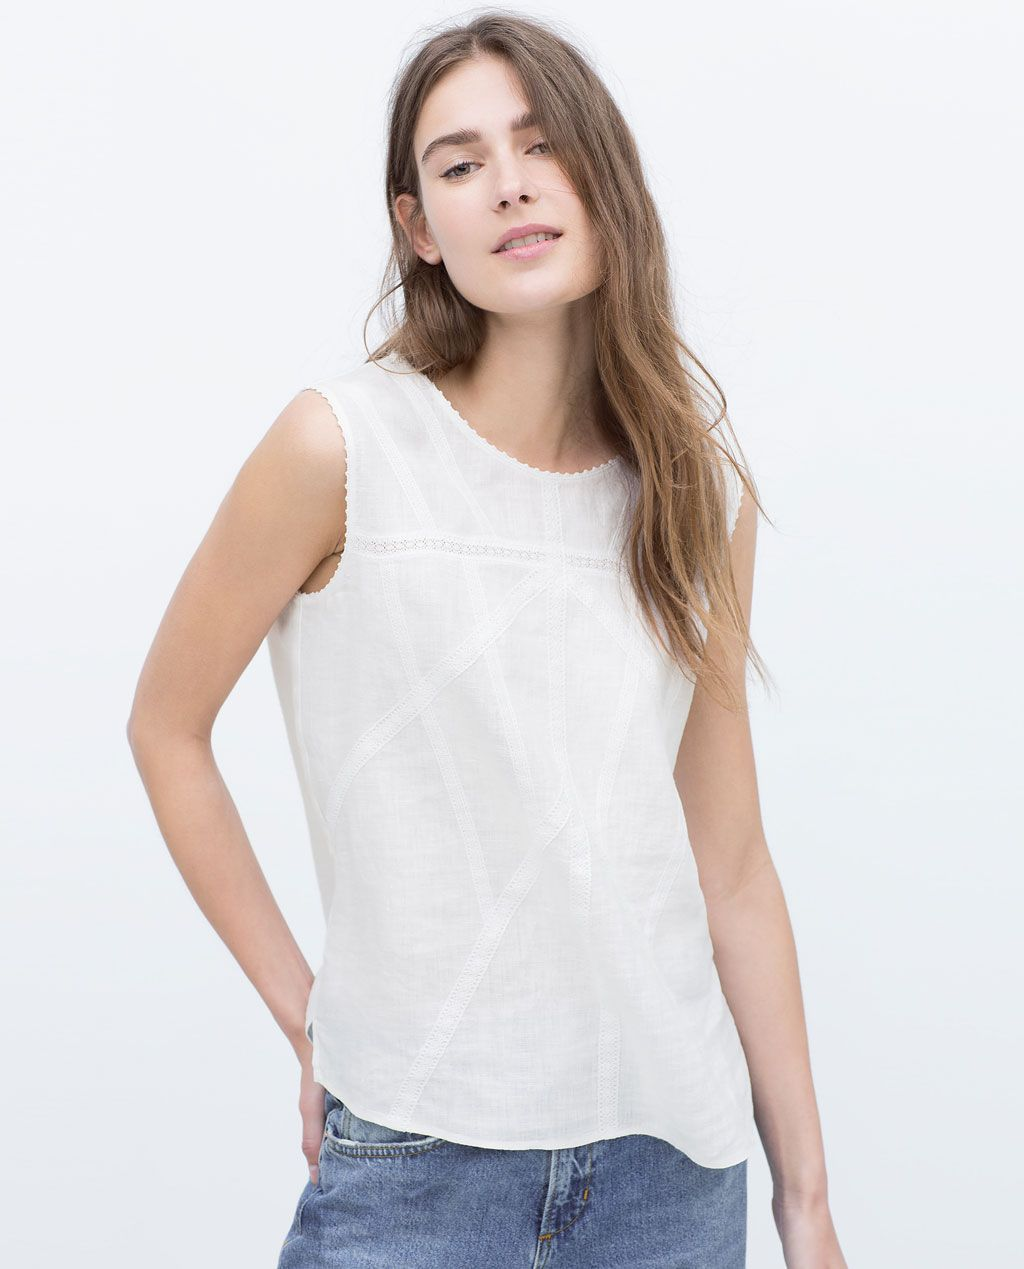 LAST!/_ZARA SS18 LINEN DRESS WITH BELT V-NECK A-LINE OFF-WHITE  4437//072 /_XS-XL